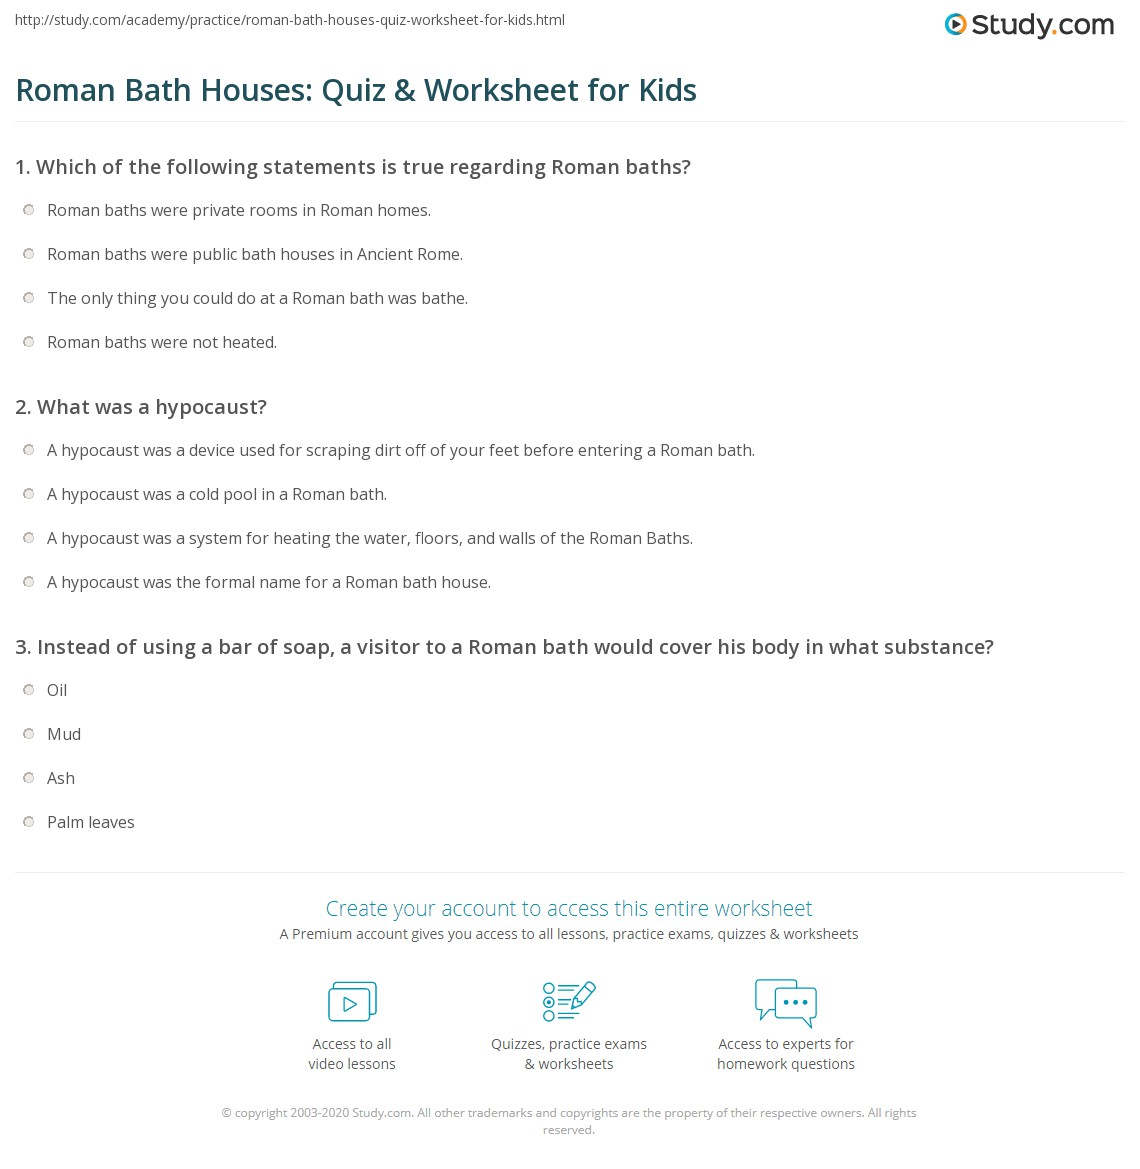 worksheet Roman Baths Worksheet roman bath houses quiz worksheet for kids study com print facts lesson worksheet